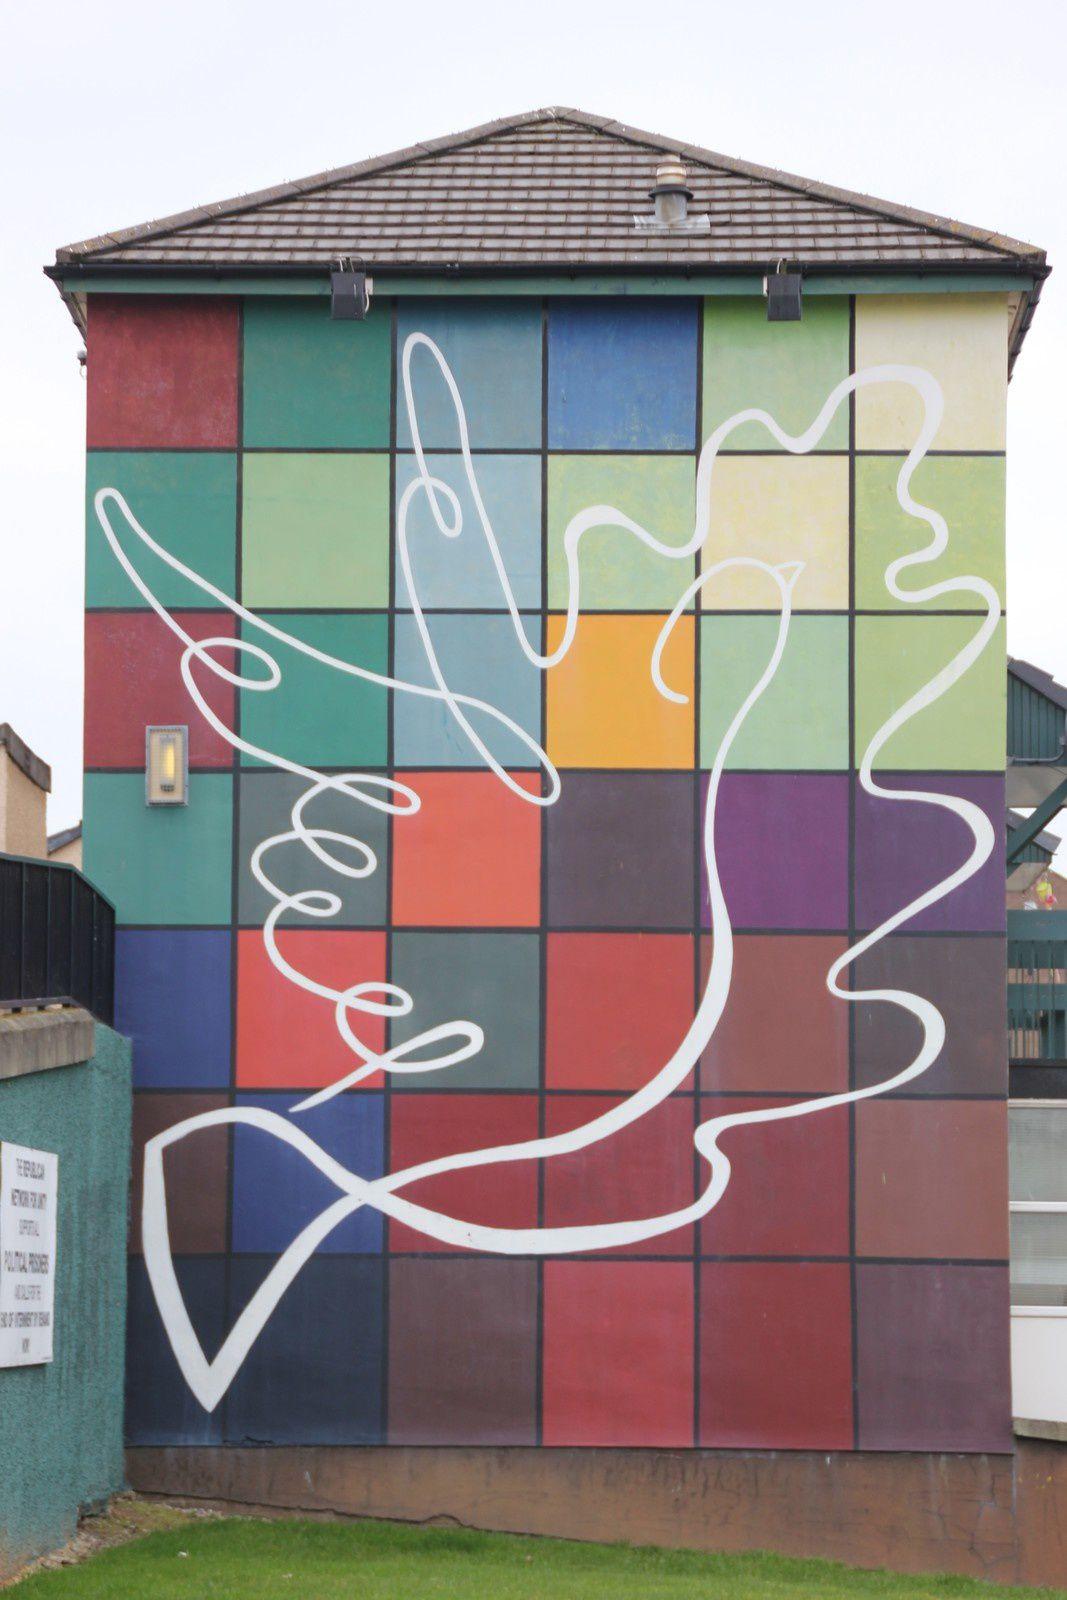 526) Rossville Street, Bogside, Derry/Londonderry